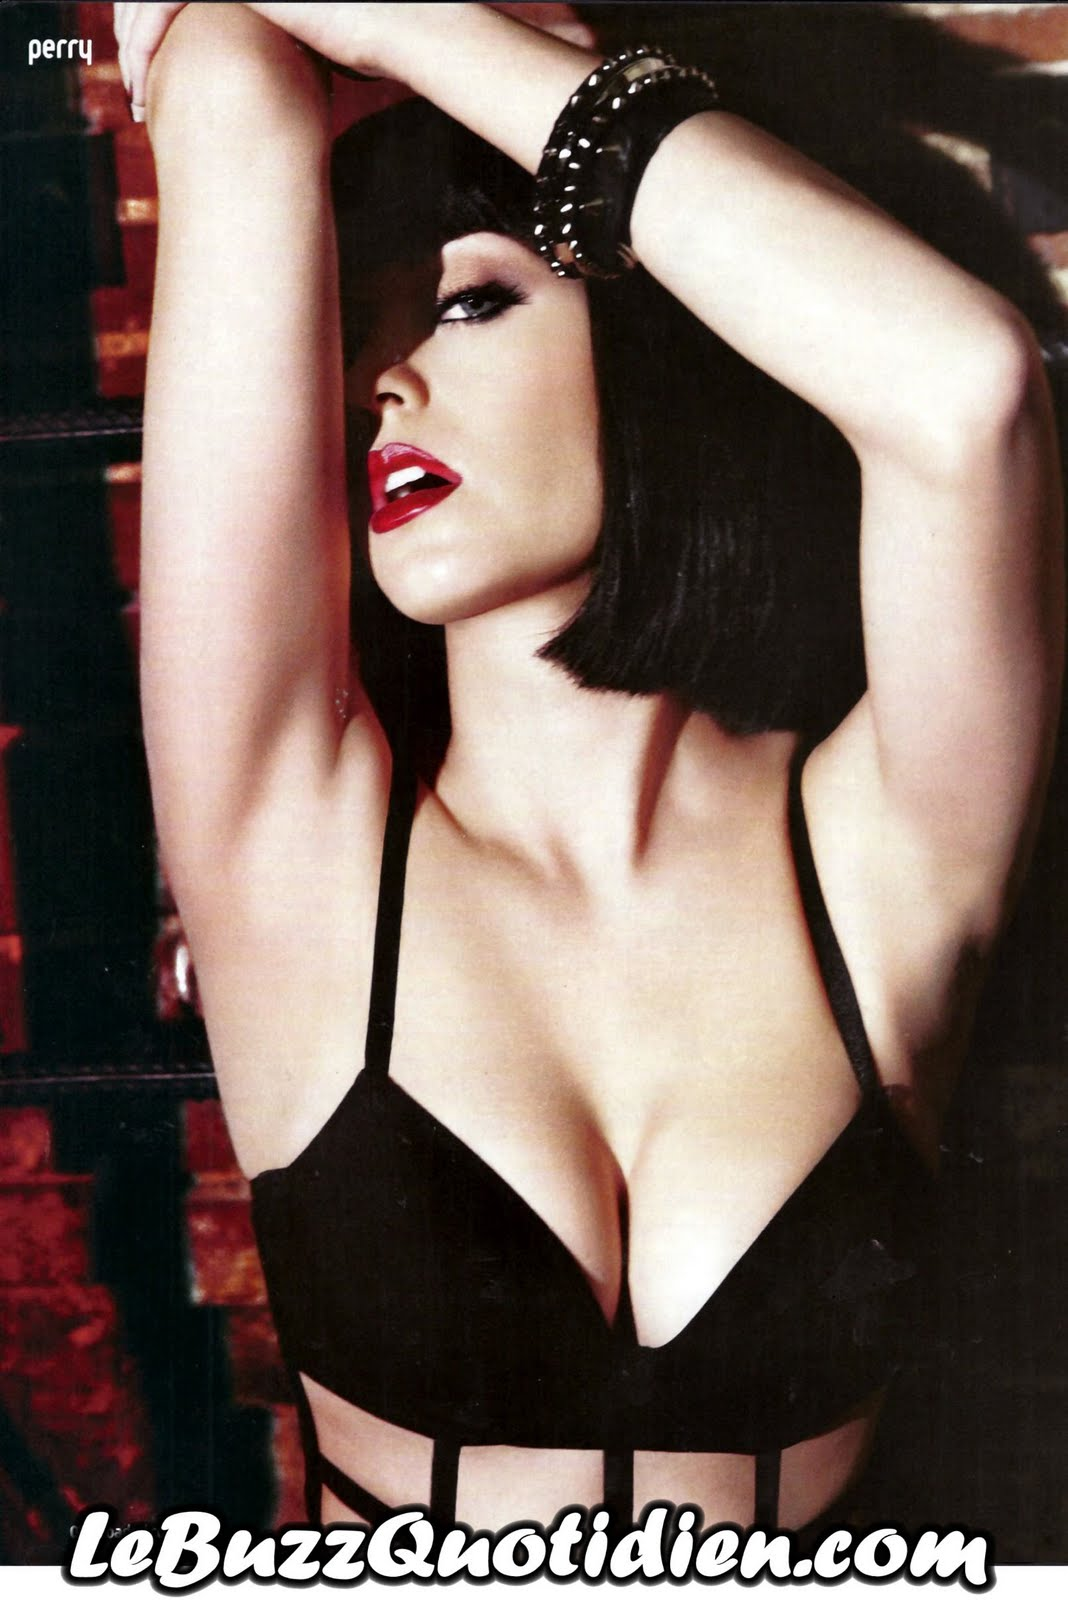 http://1.bp.blogspot.com/_hrzGMWAANvs/TPzwCX6RpuI/AAAAAAAAFZE/iFcpehj_bsE/s1600/Katy-Perry-2.jpg